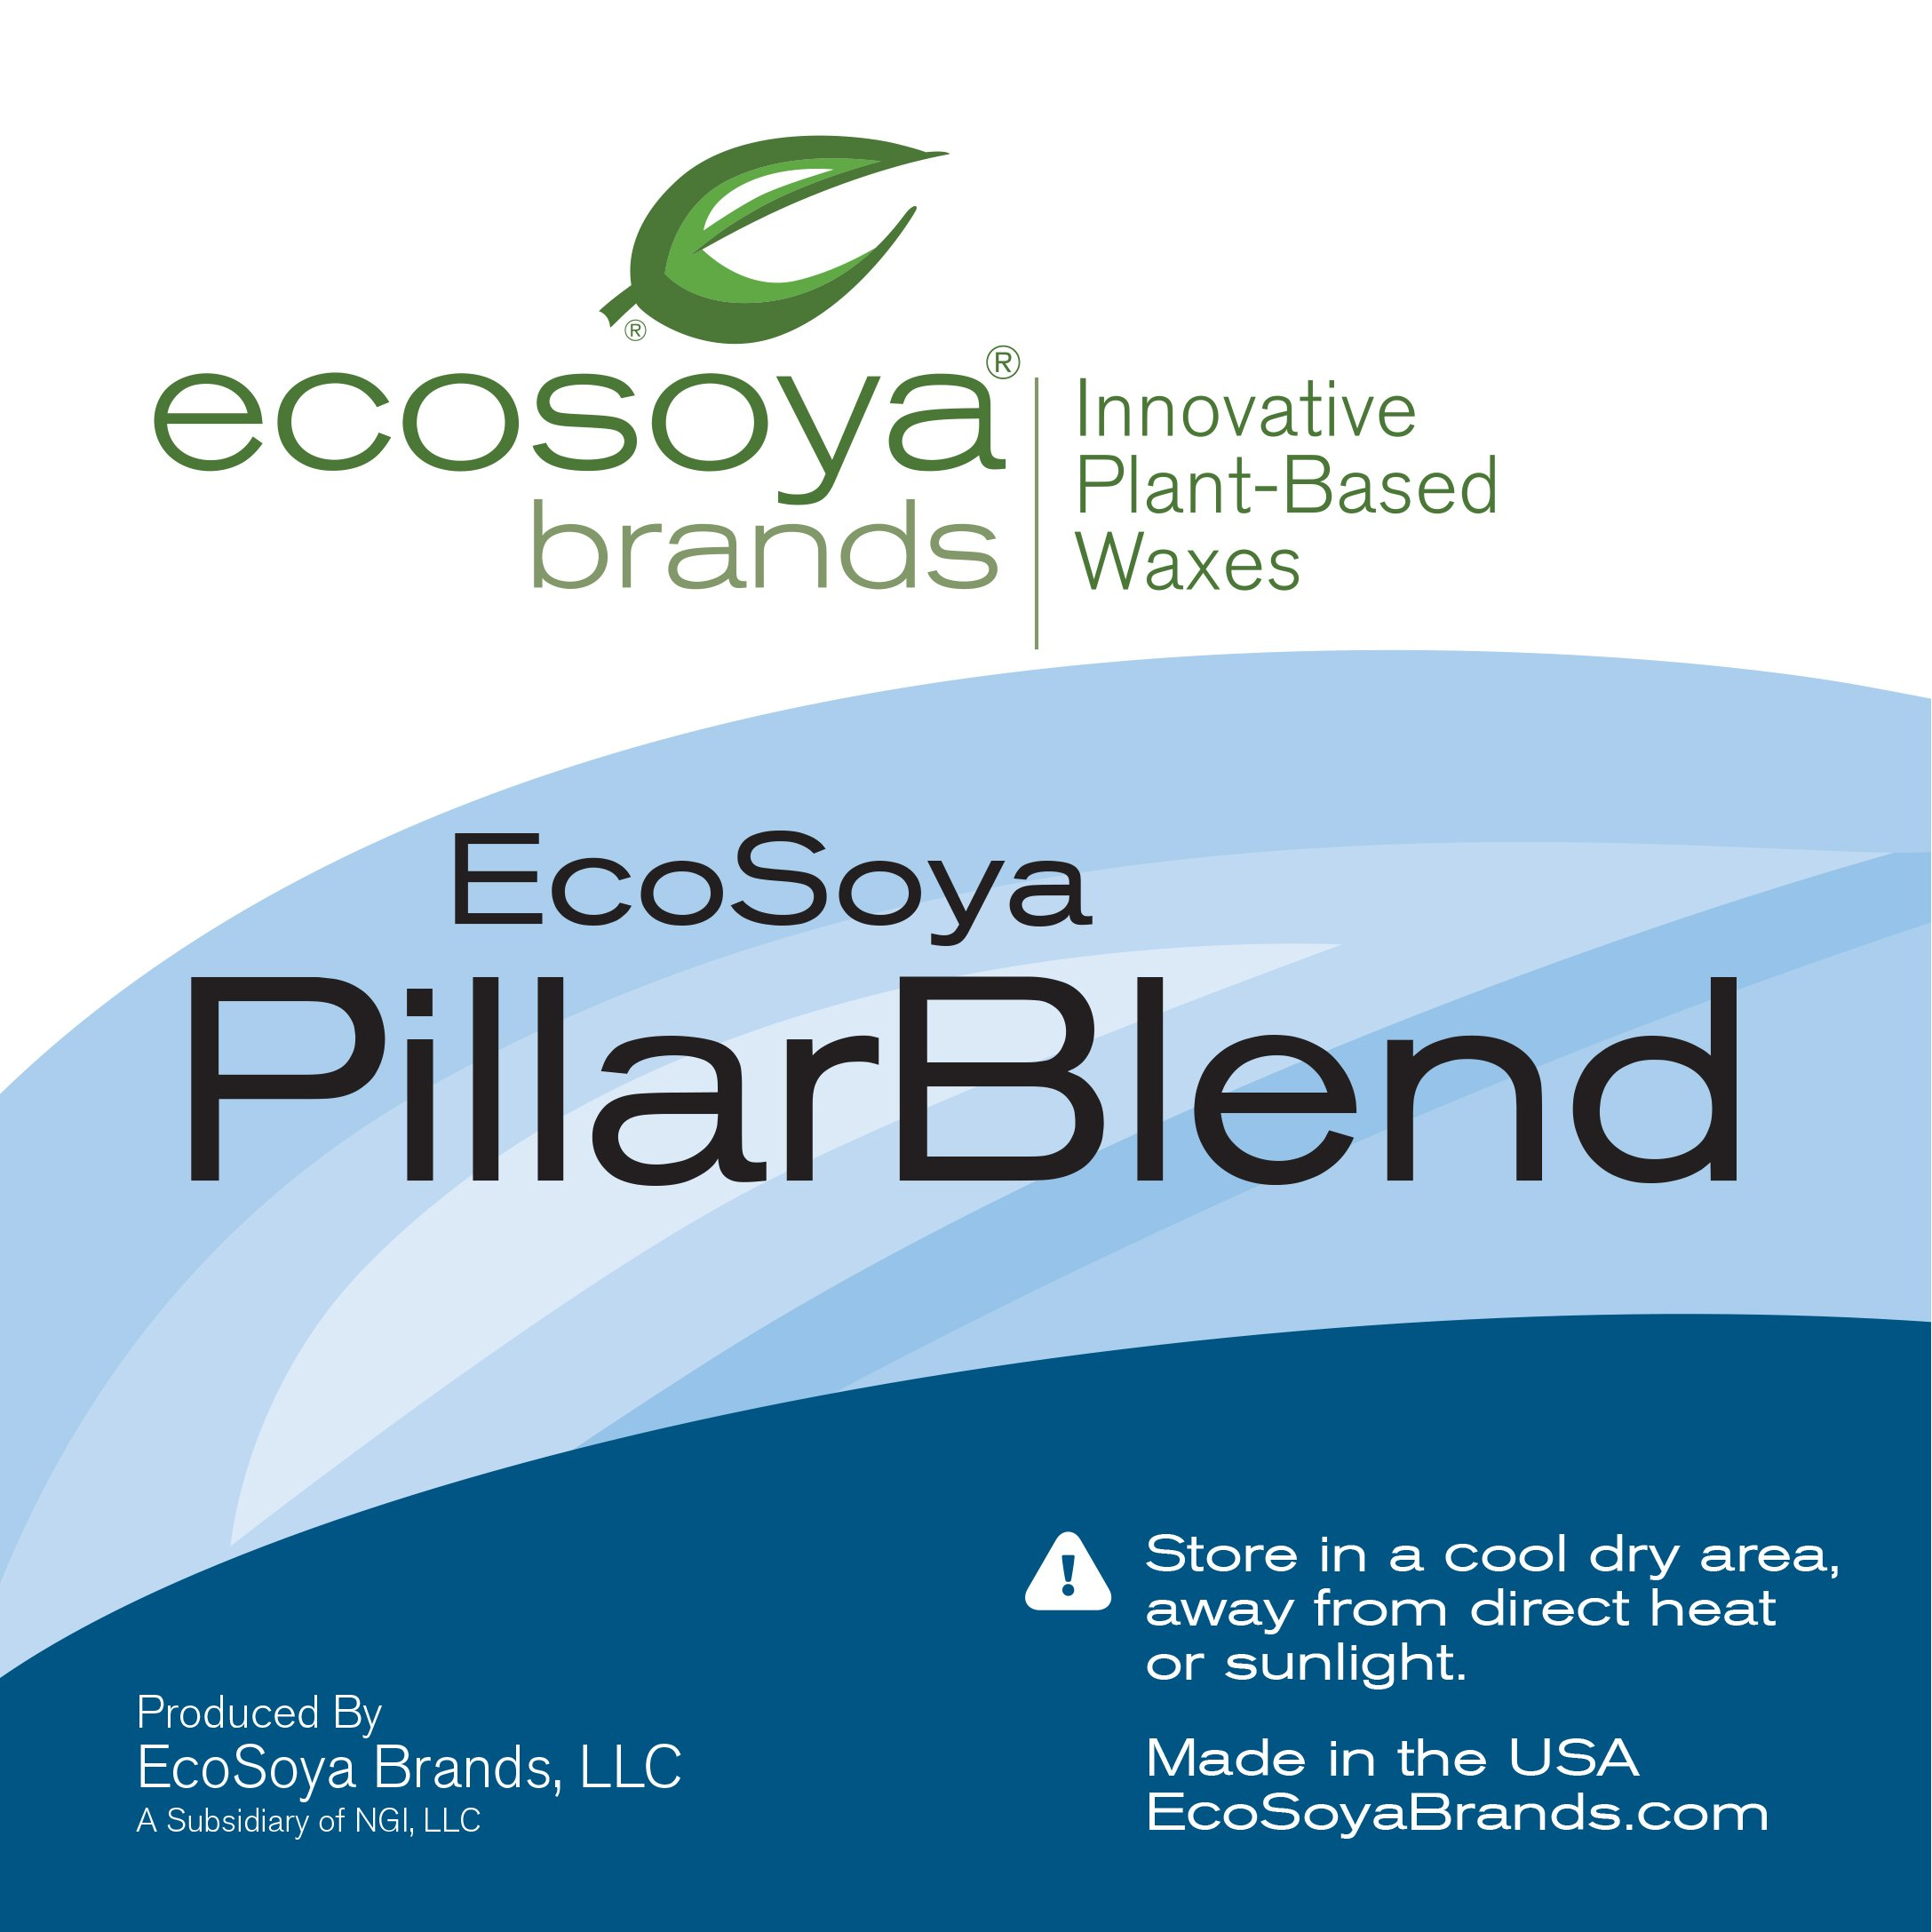 Eco Soya CB-PB Soy Wax (10 pound bag)